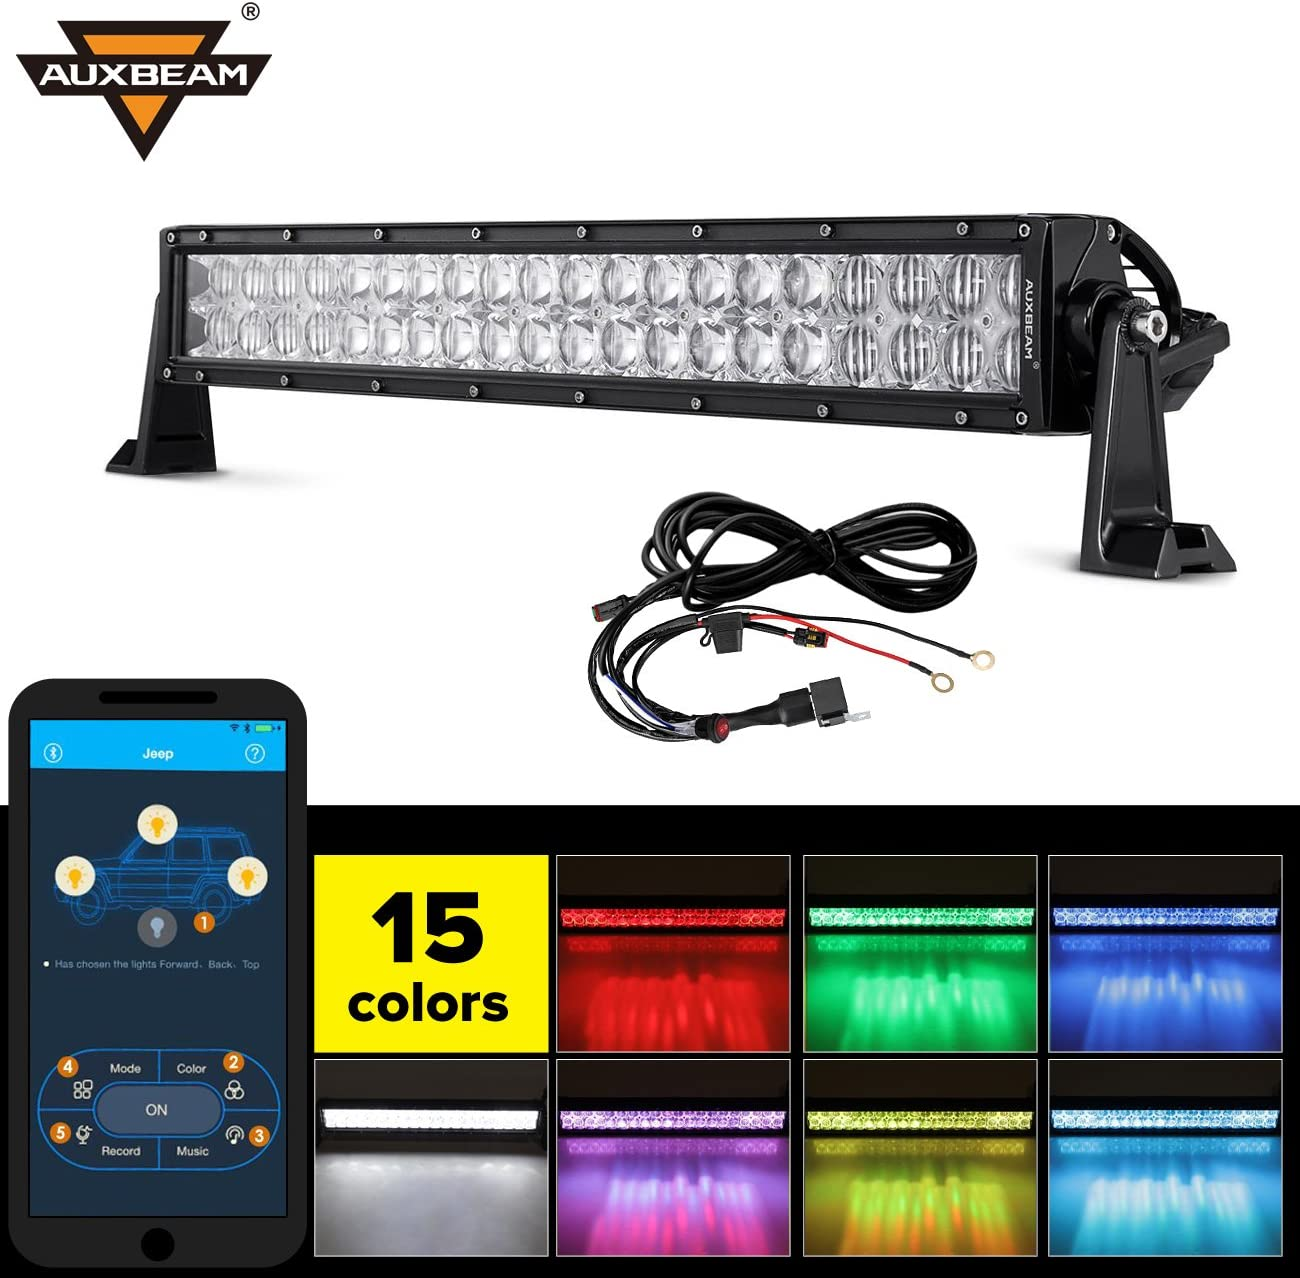 Amazon.com: Auxbeam 22 Inch RGB LED Light Bar Multi-color light bar 5D V  Series 120W Led Bar Off road Driving light Spot Flood Combo Beam with  Bluetooth App & Wiring Harness: AutomotiveAmazon.com